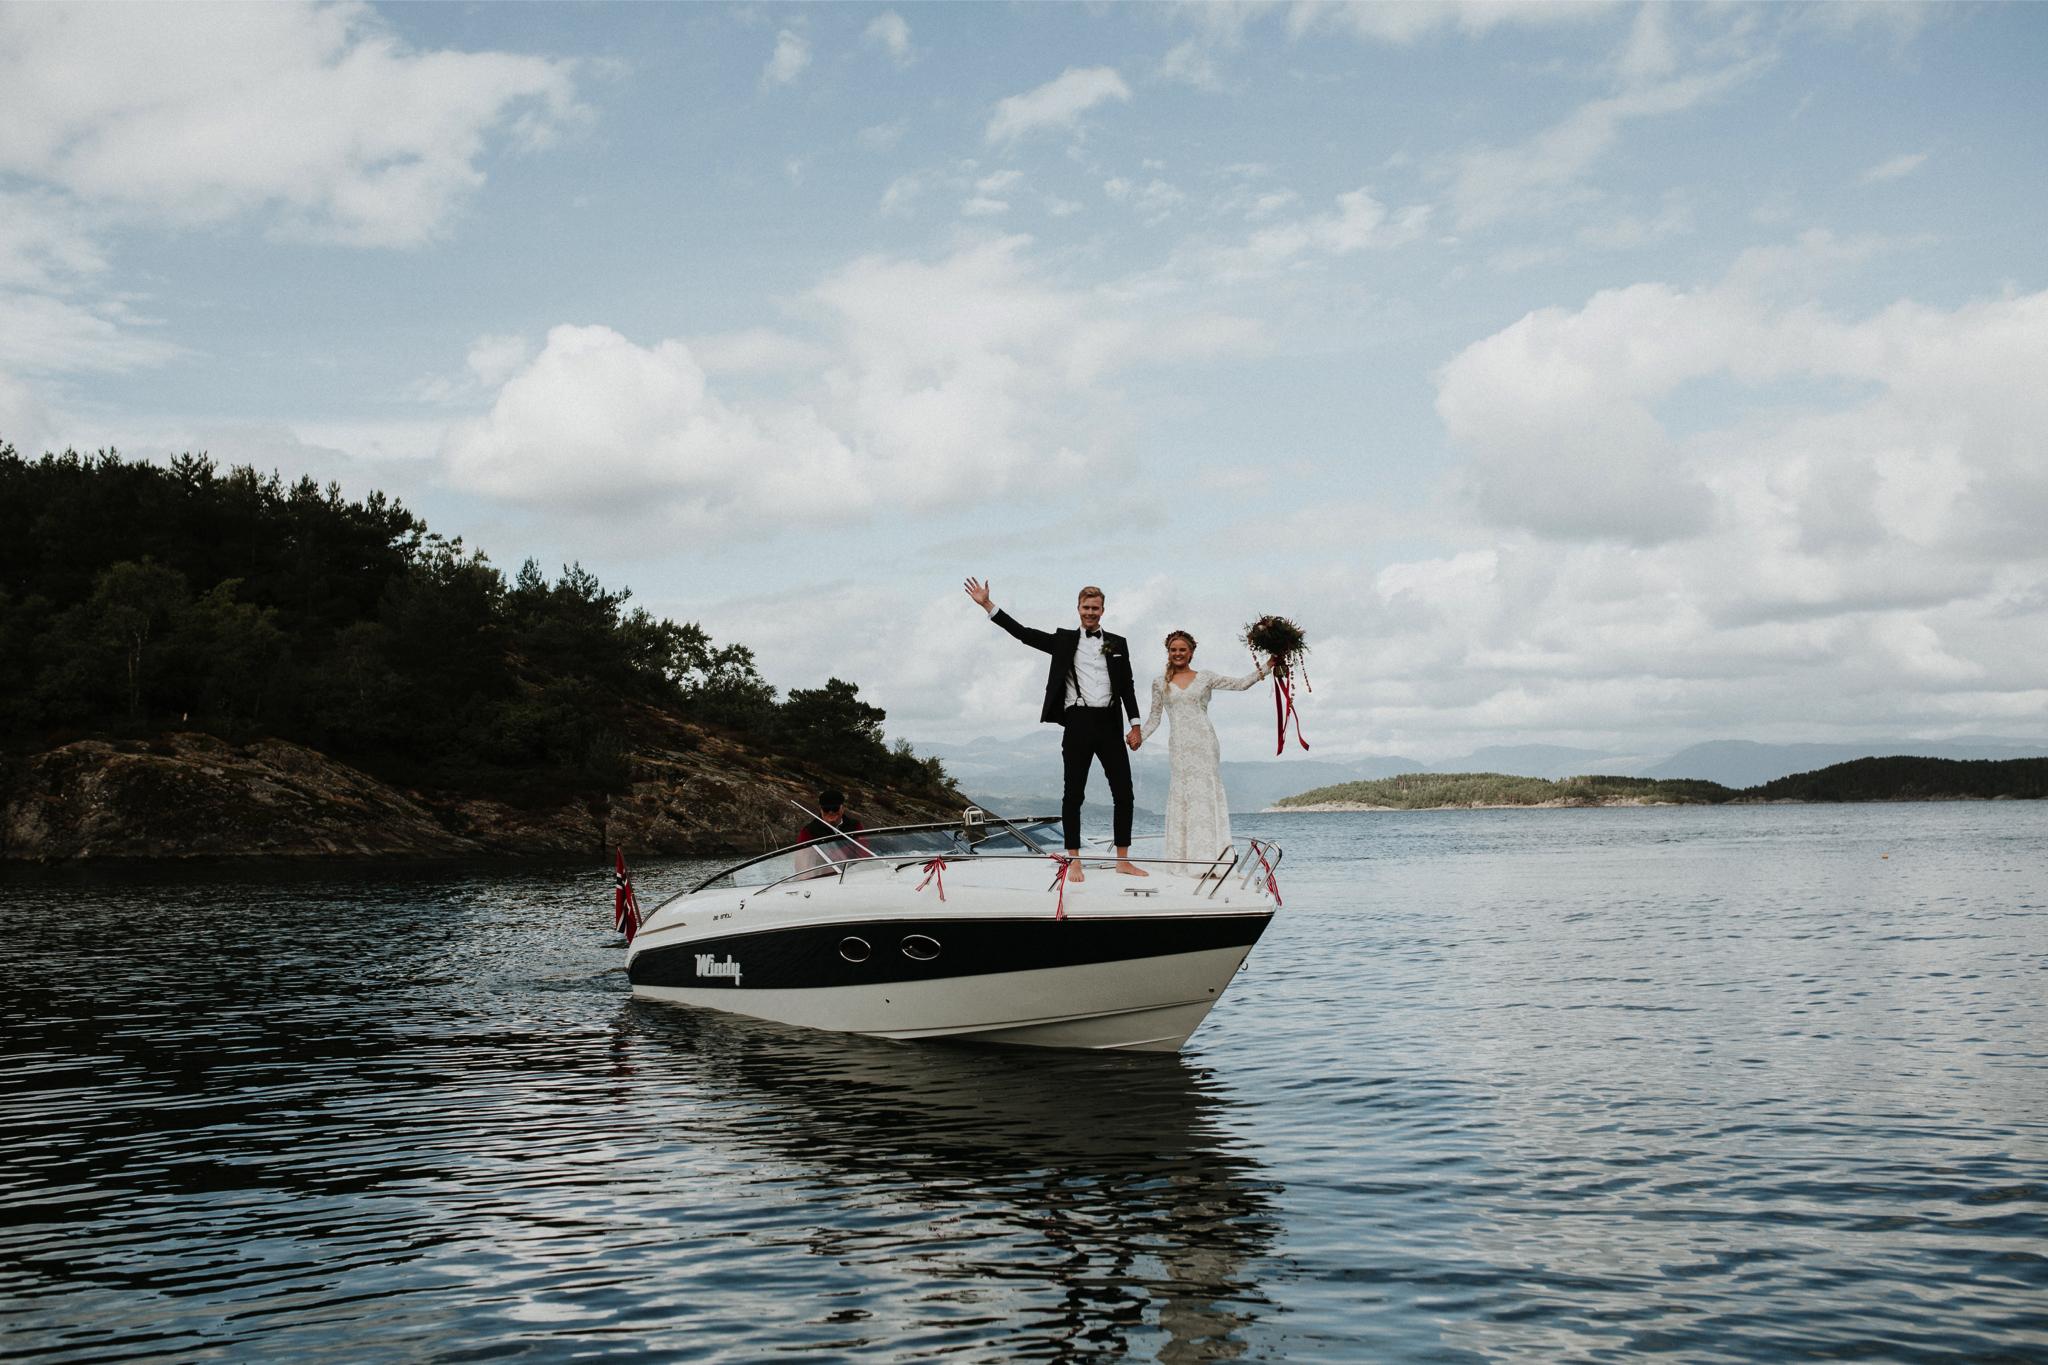 Norway-wedding-photographer-adventure-session_3.jpg